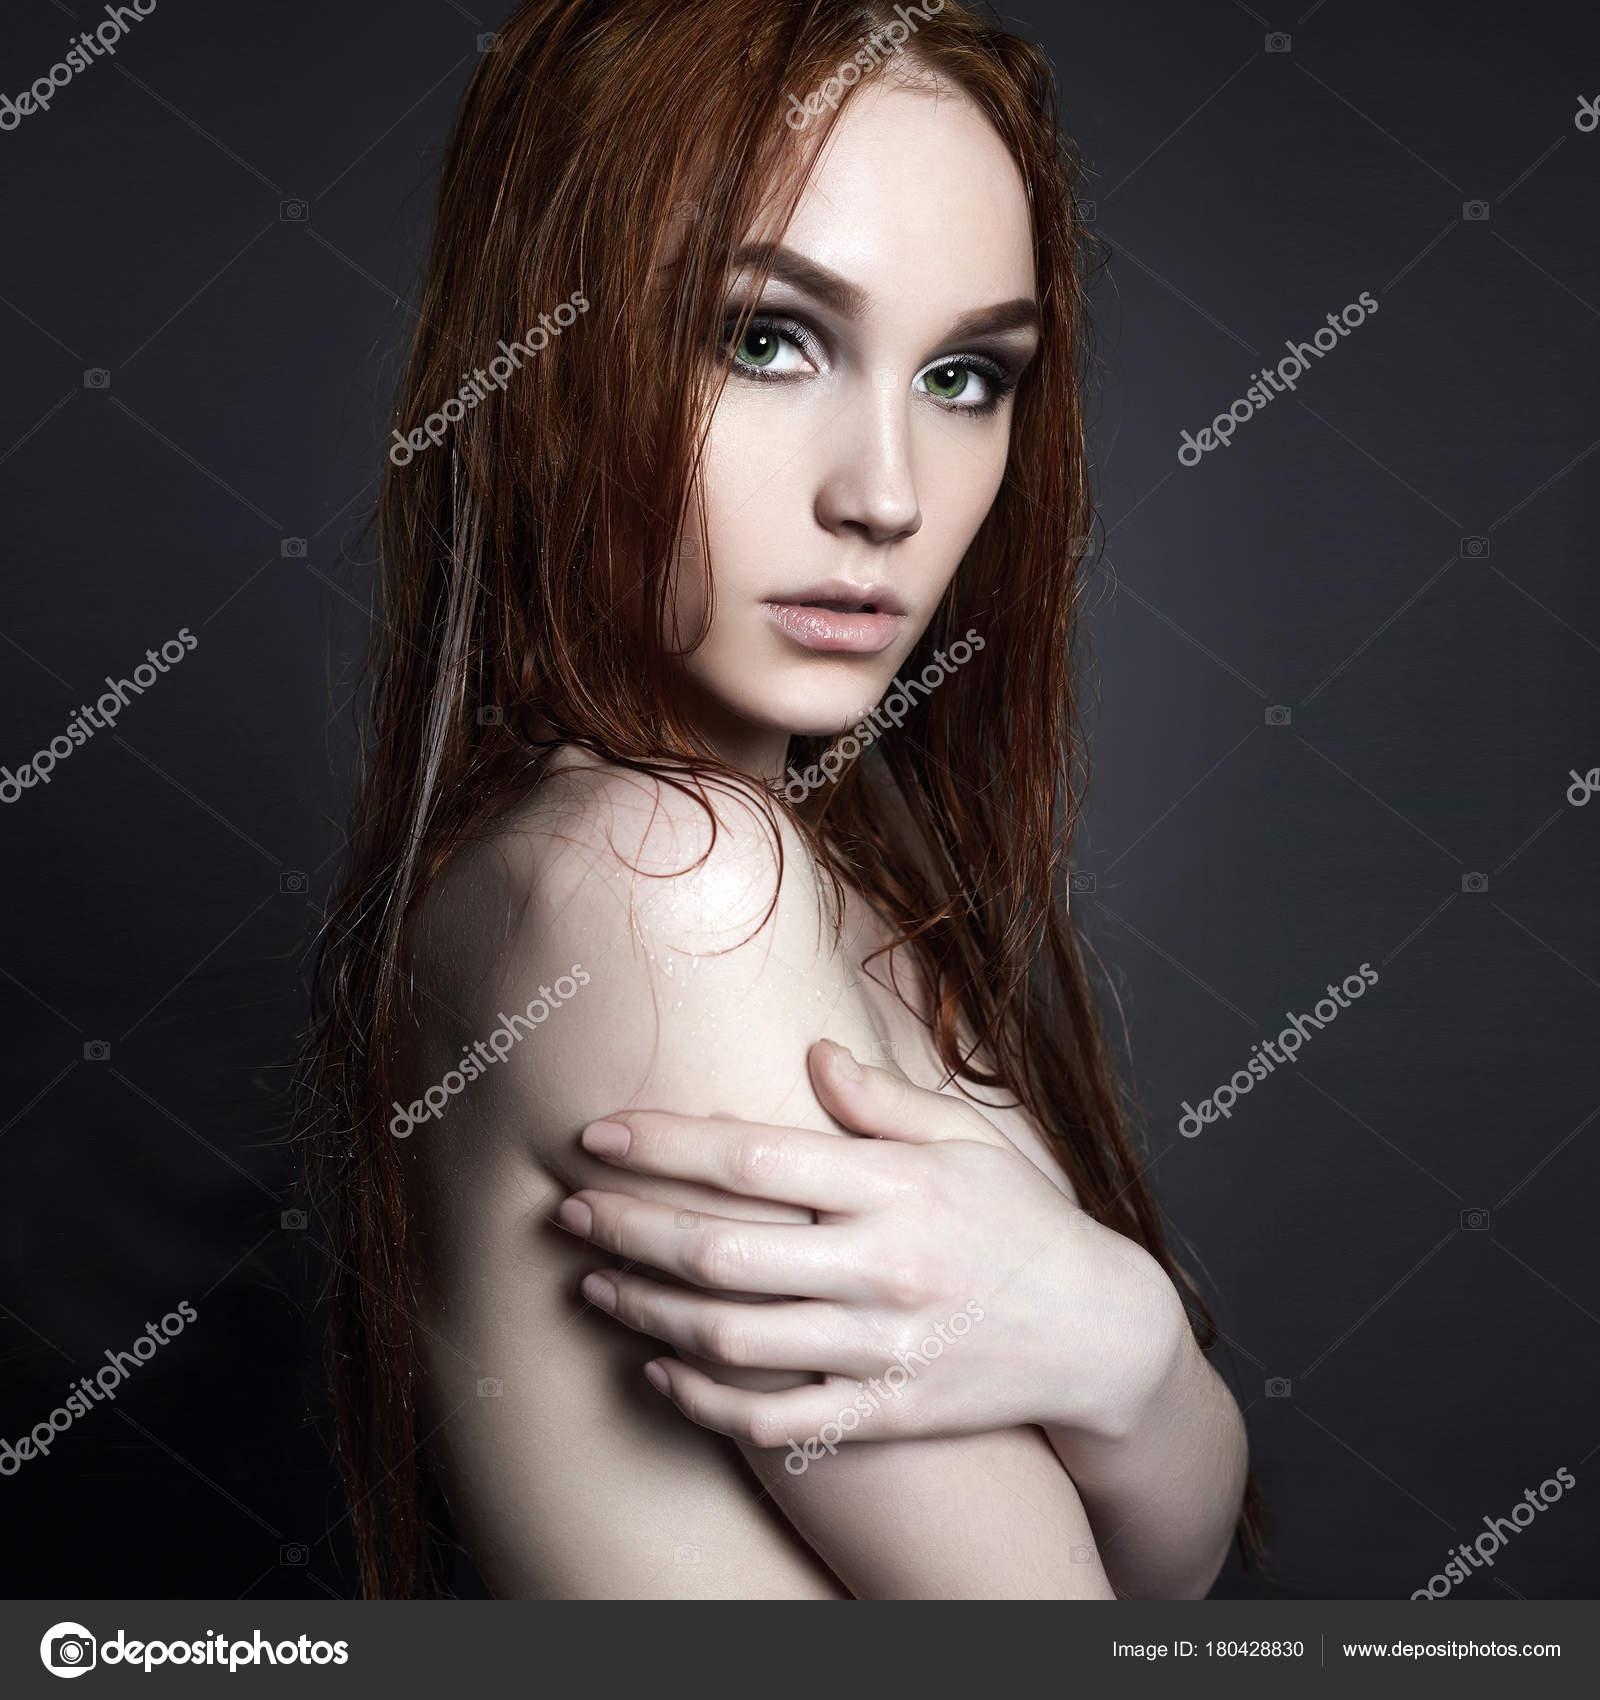 beauty naked wet girl — stock photo © eugenepartyzan #180428830